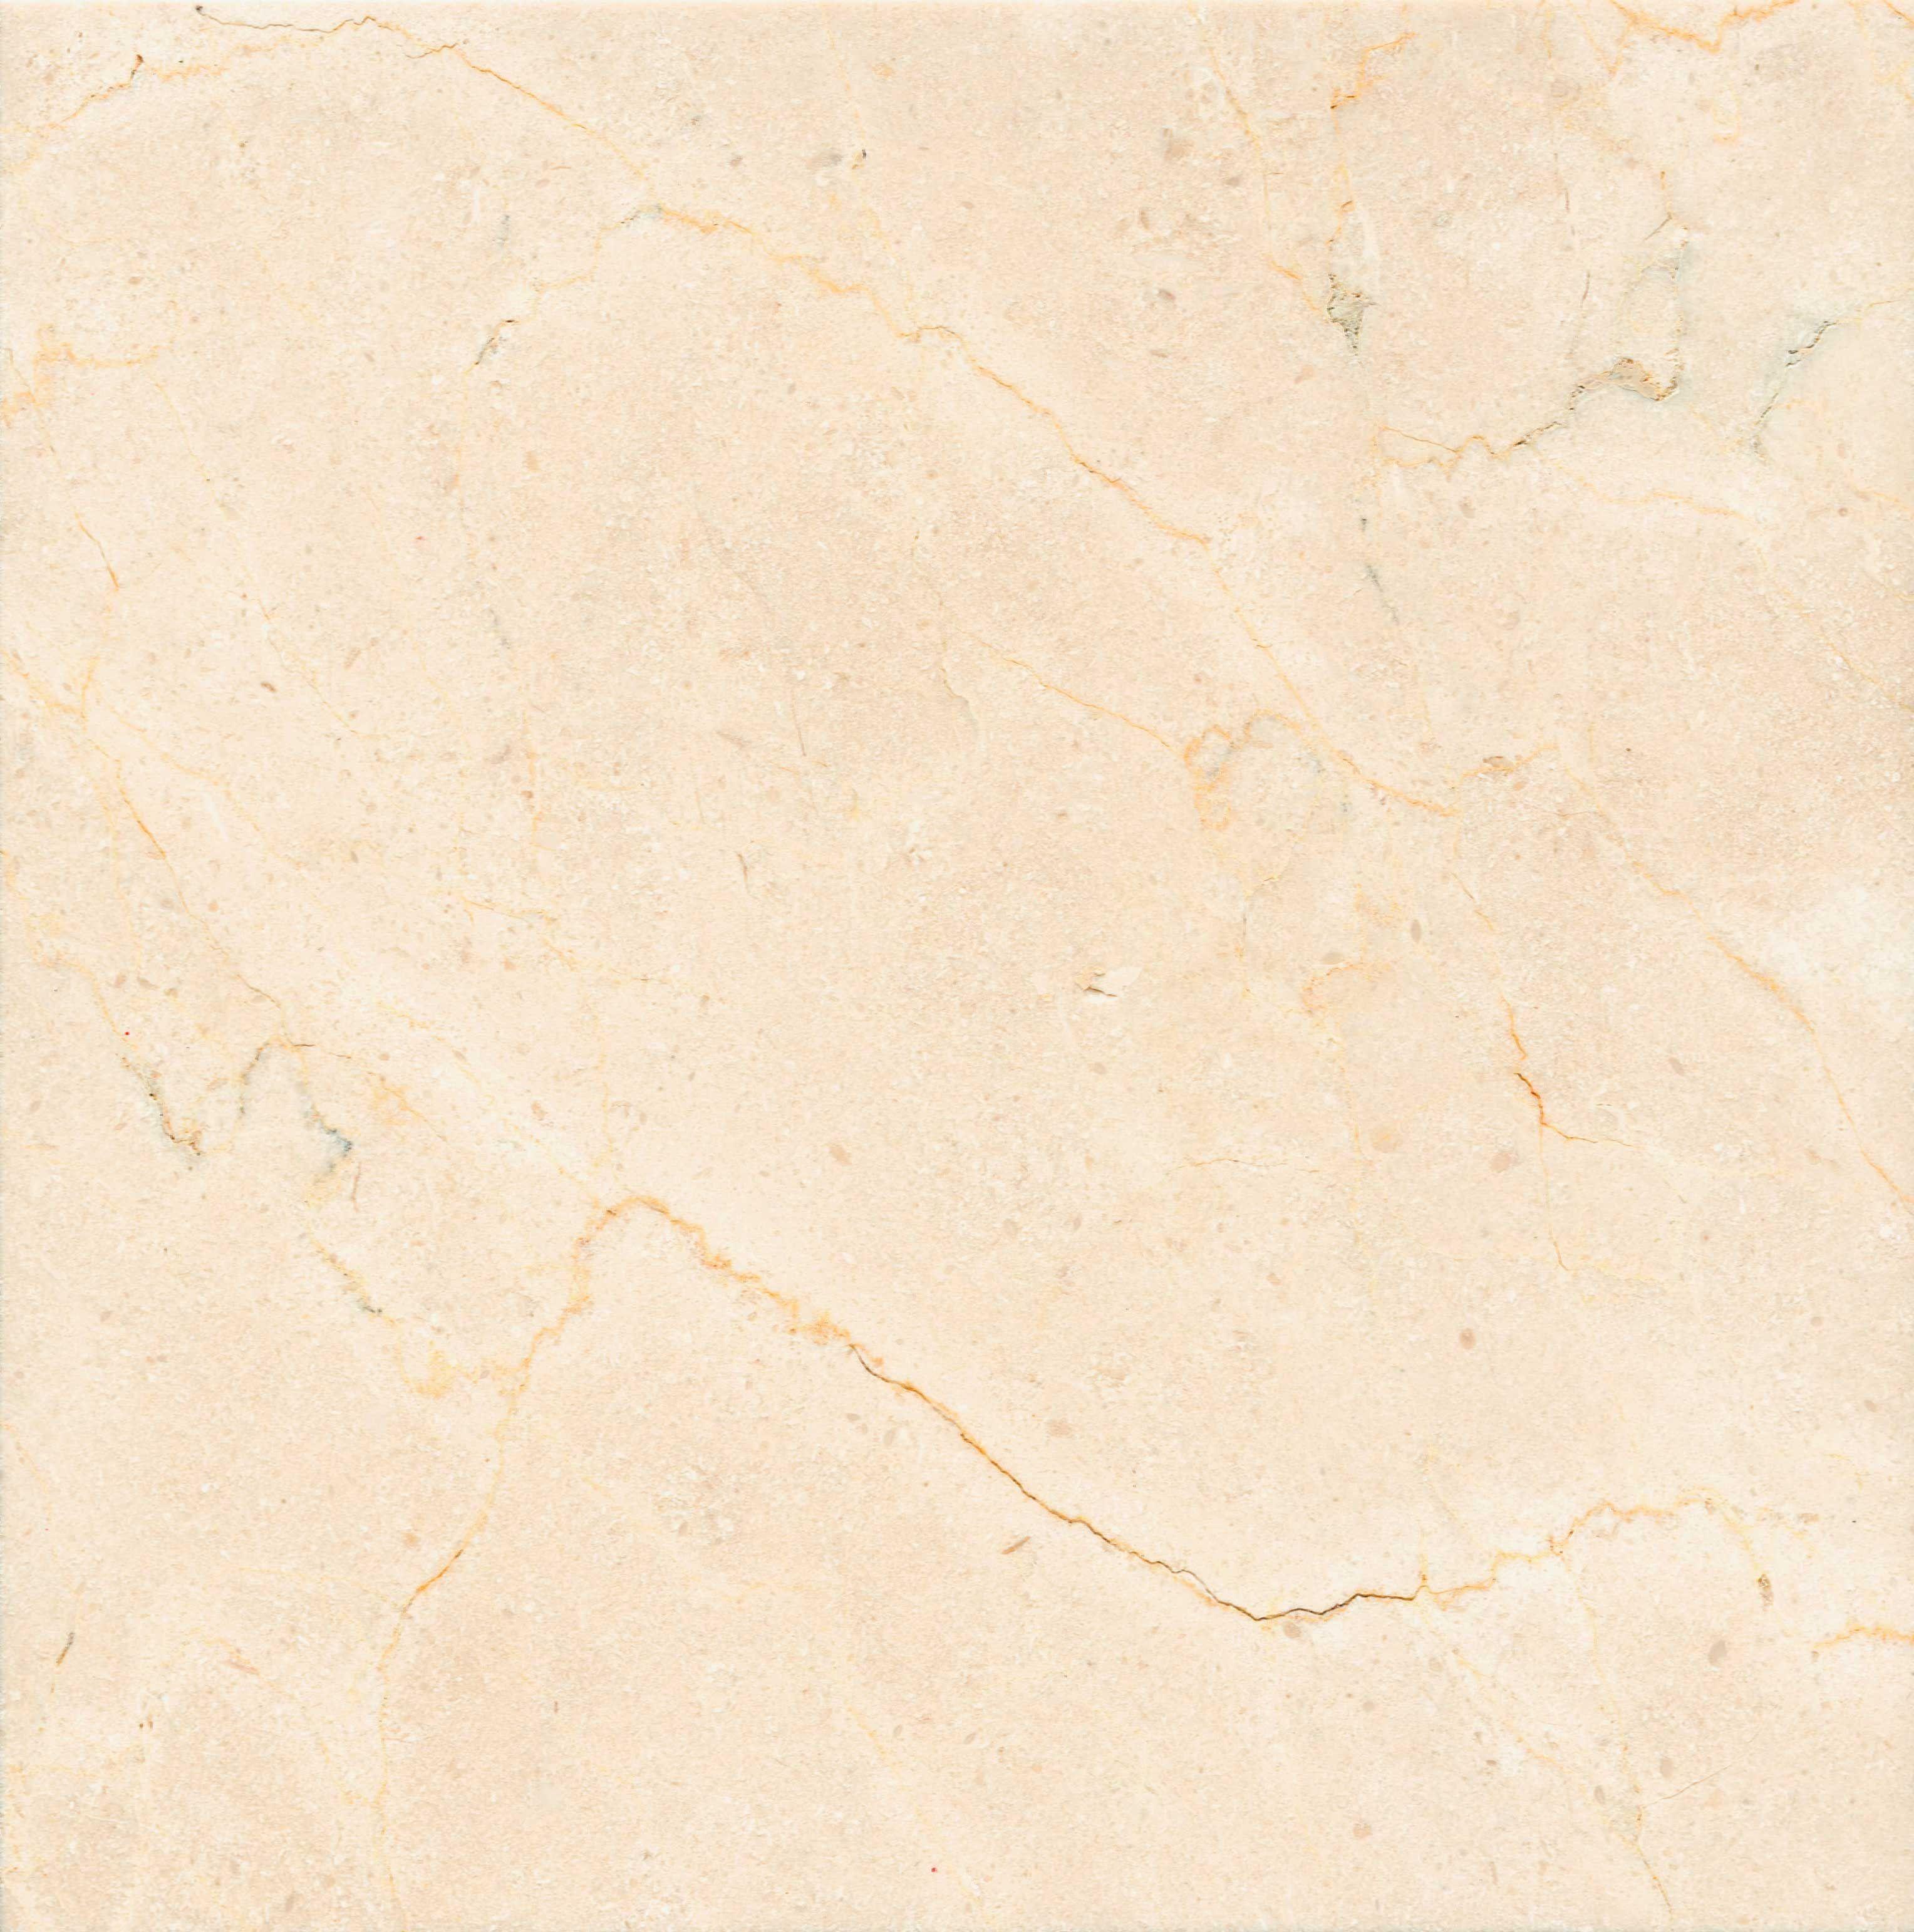 Marmol Crema Marfil Marble Natural Stones Interior Decorating